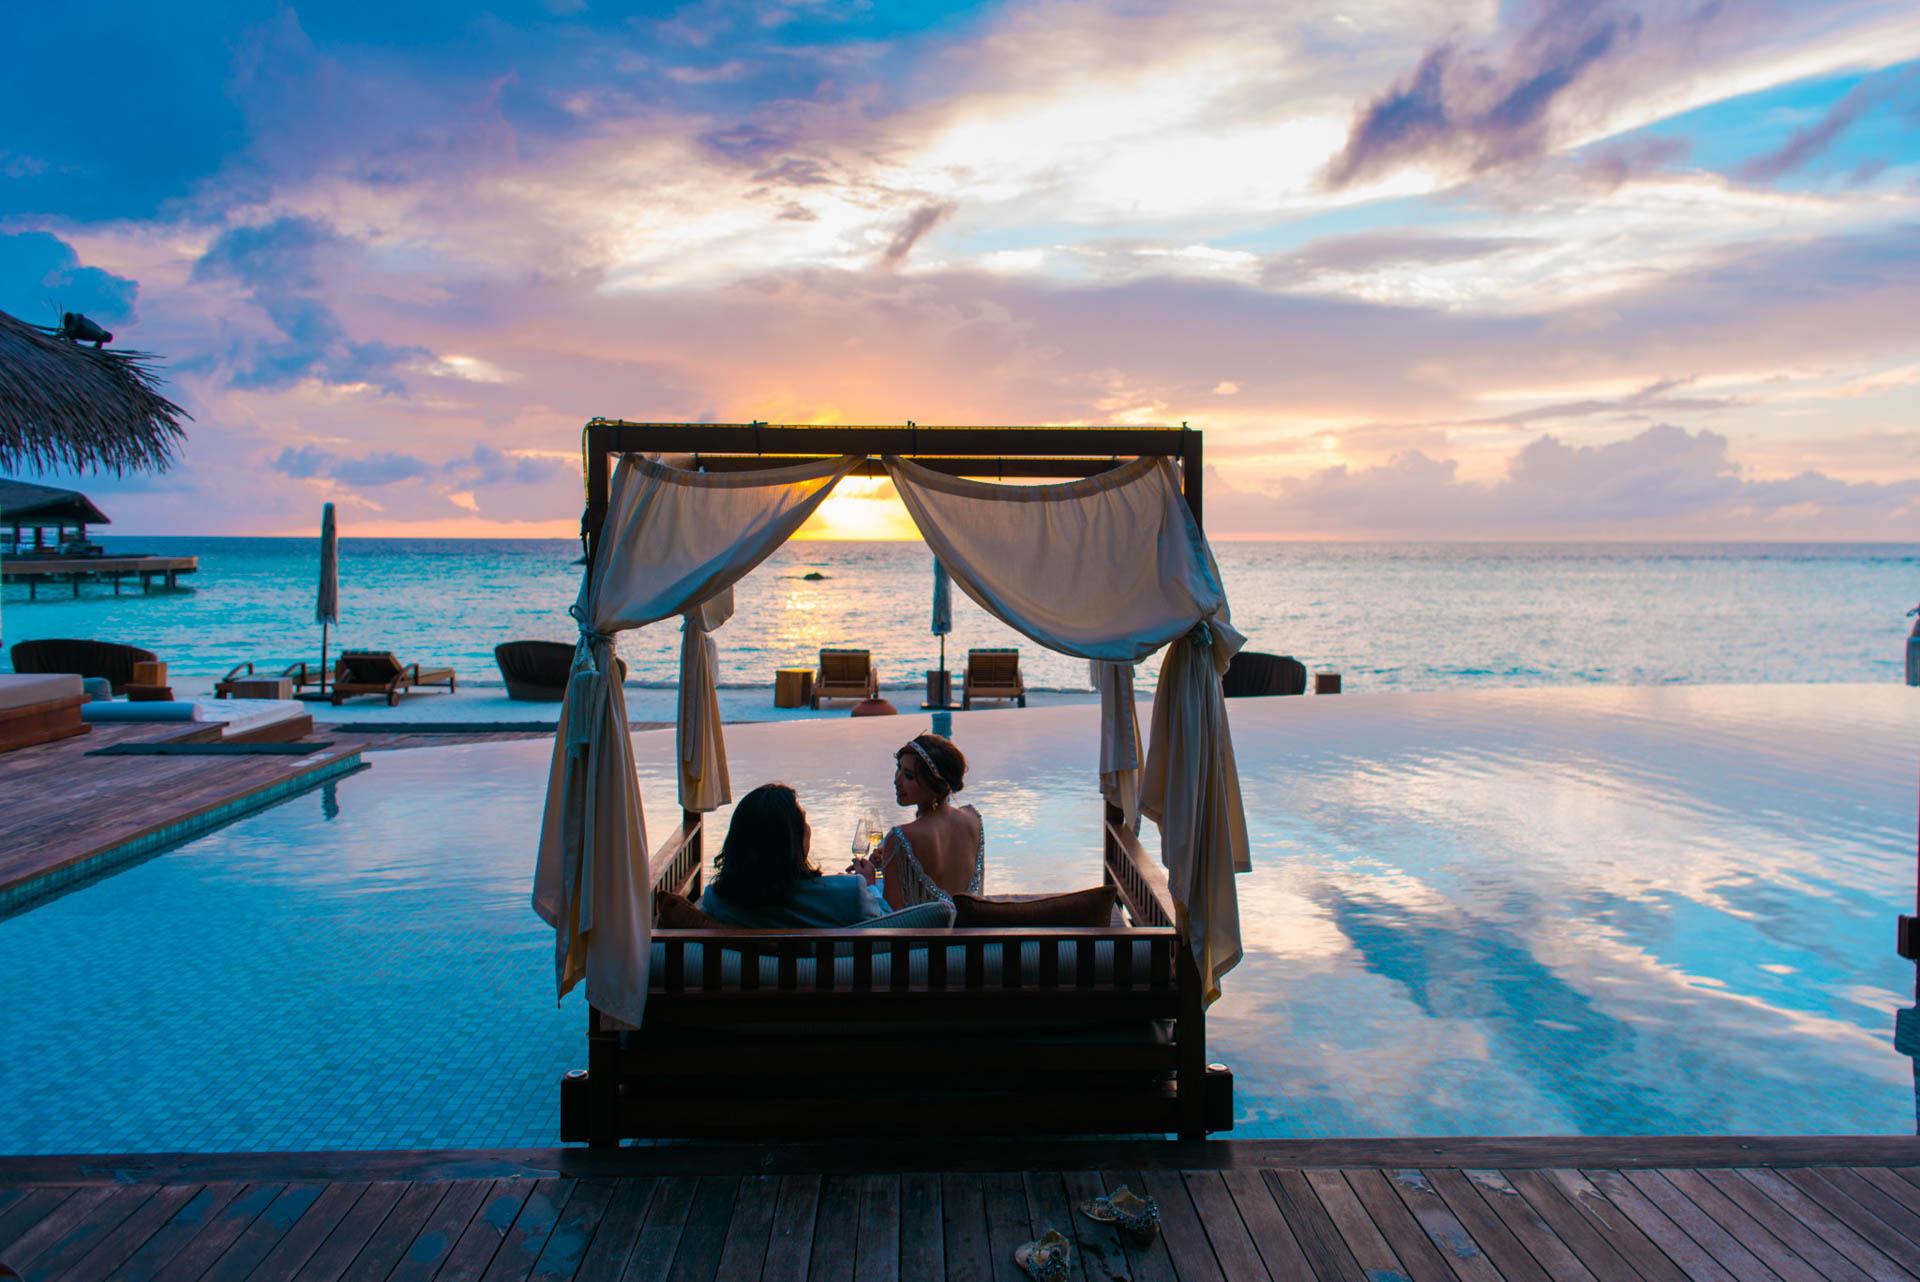 Chih Chao Yu Shan Destination Wedding at Residence Maldives 4